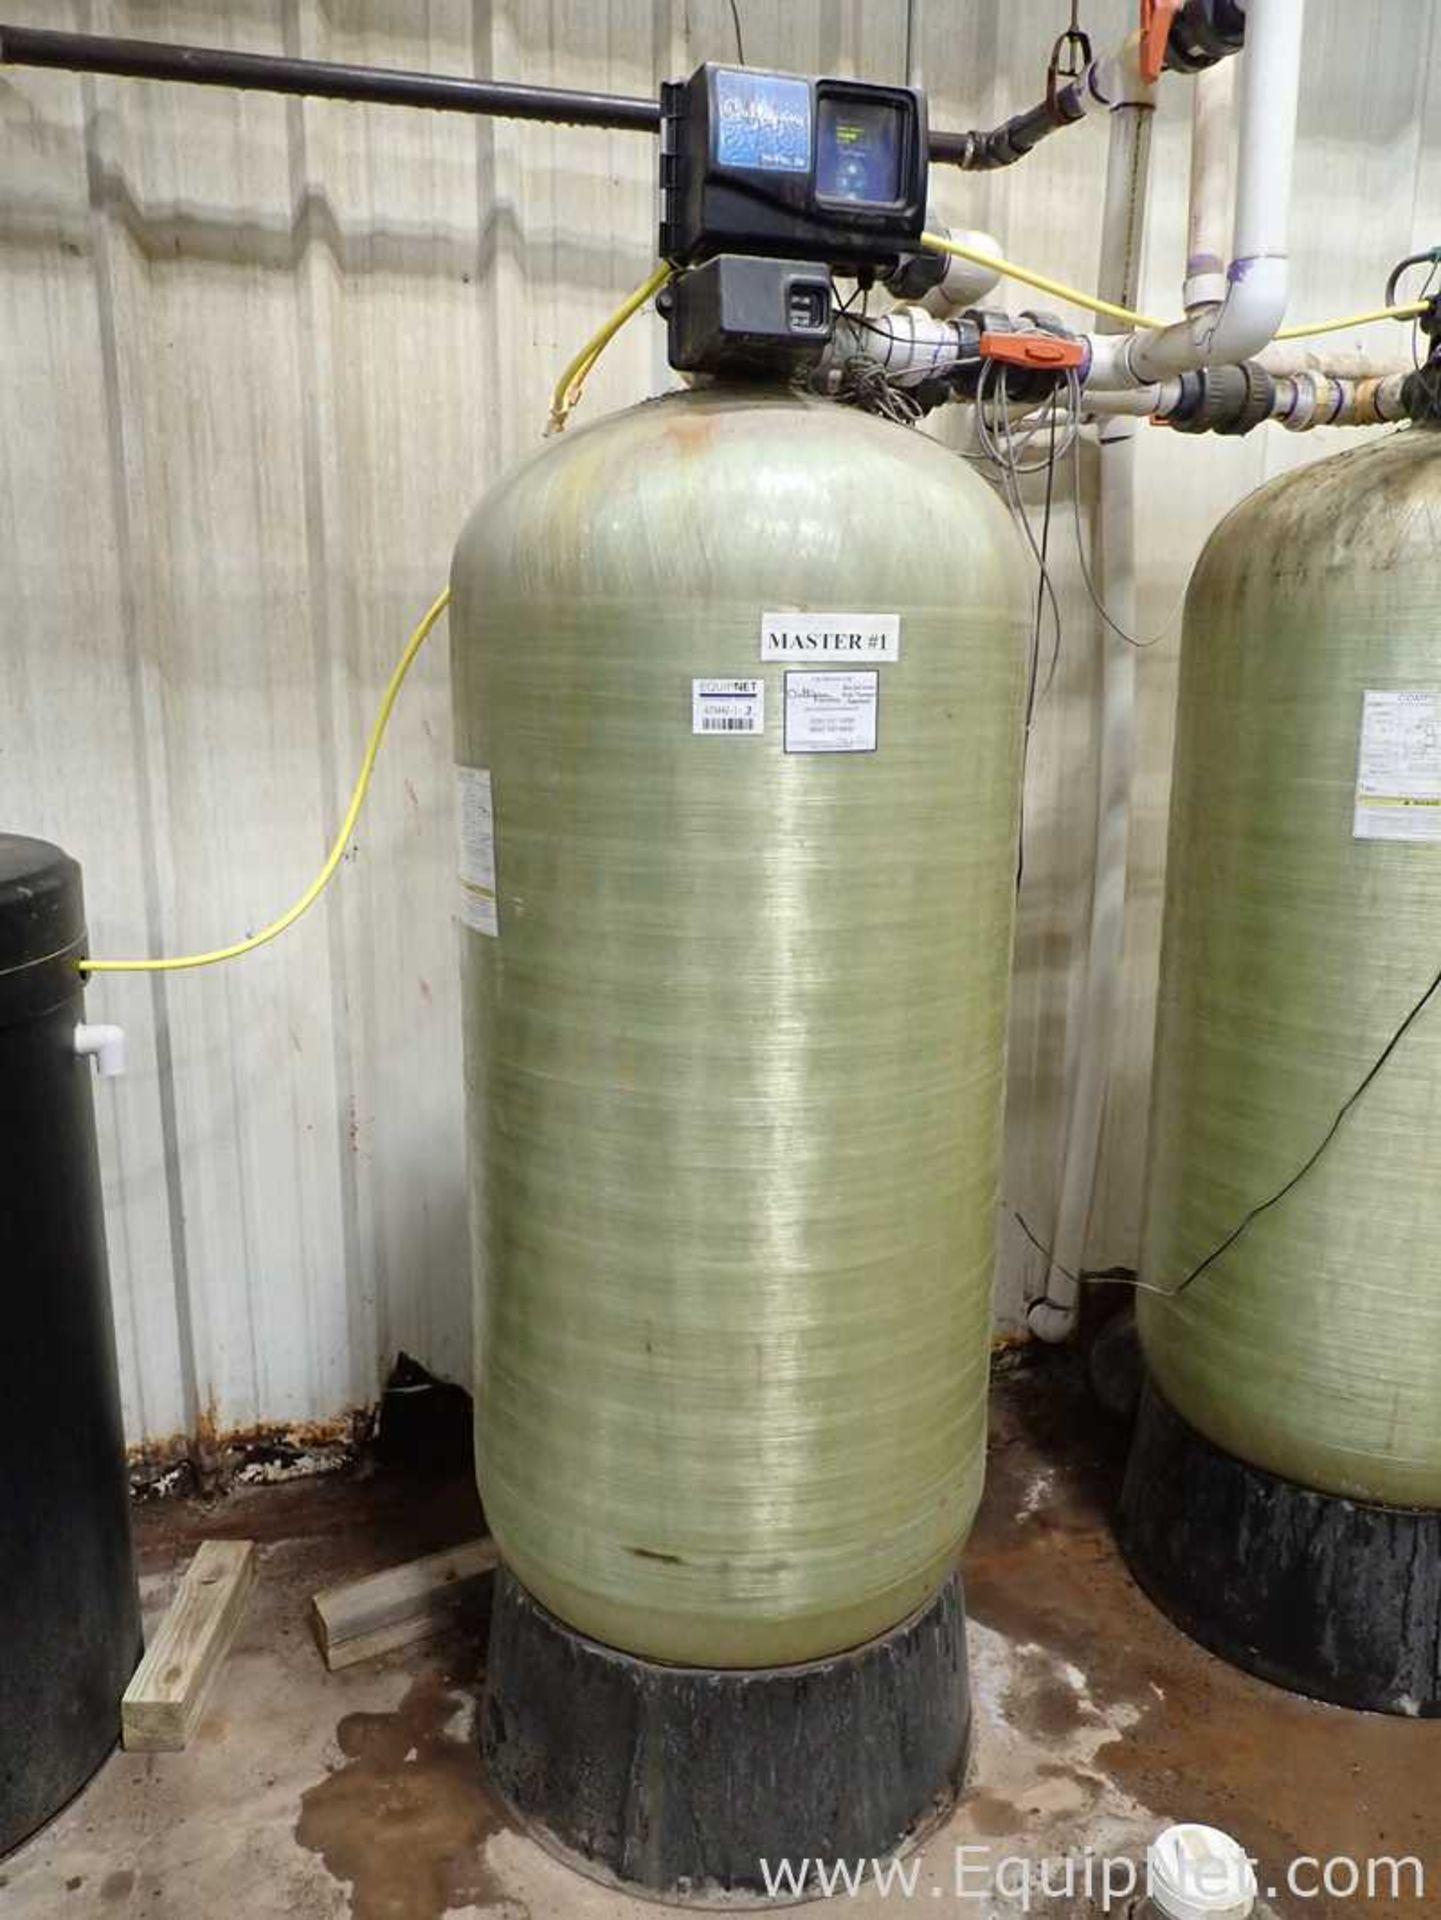 Culligan Hi-Flo 3e Water Softener System - Image 4 of 9